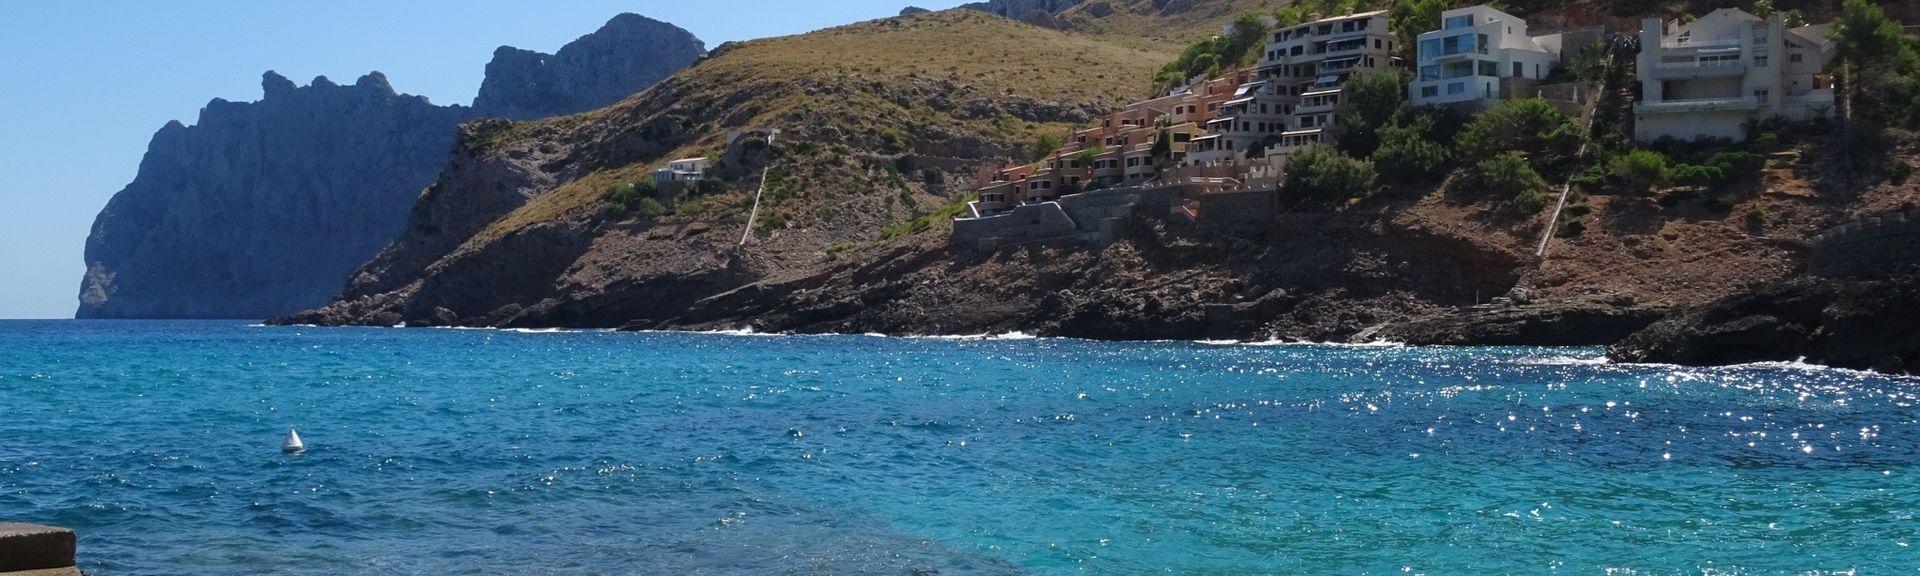 Gentilicio, Palma, Balearic Islands, Spain